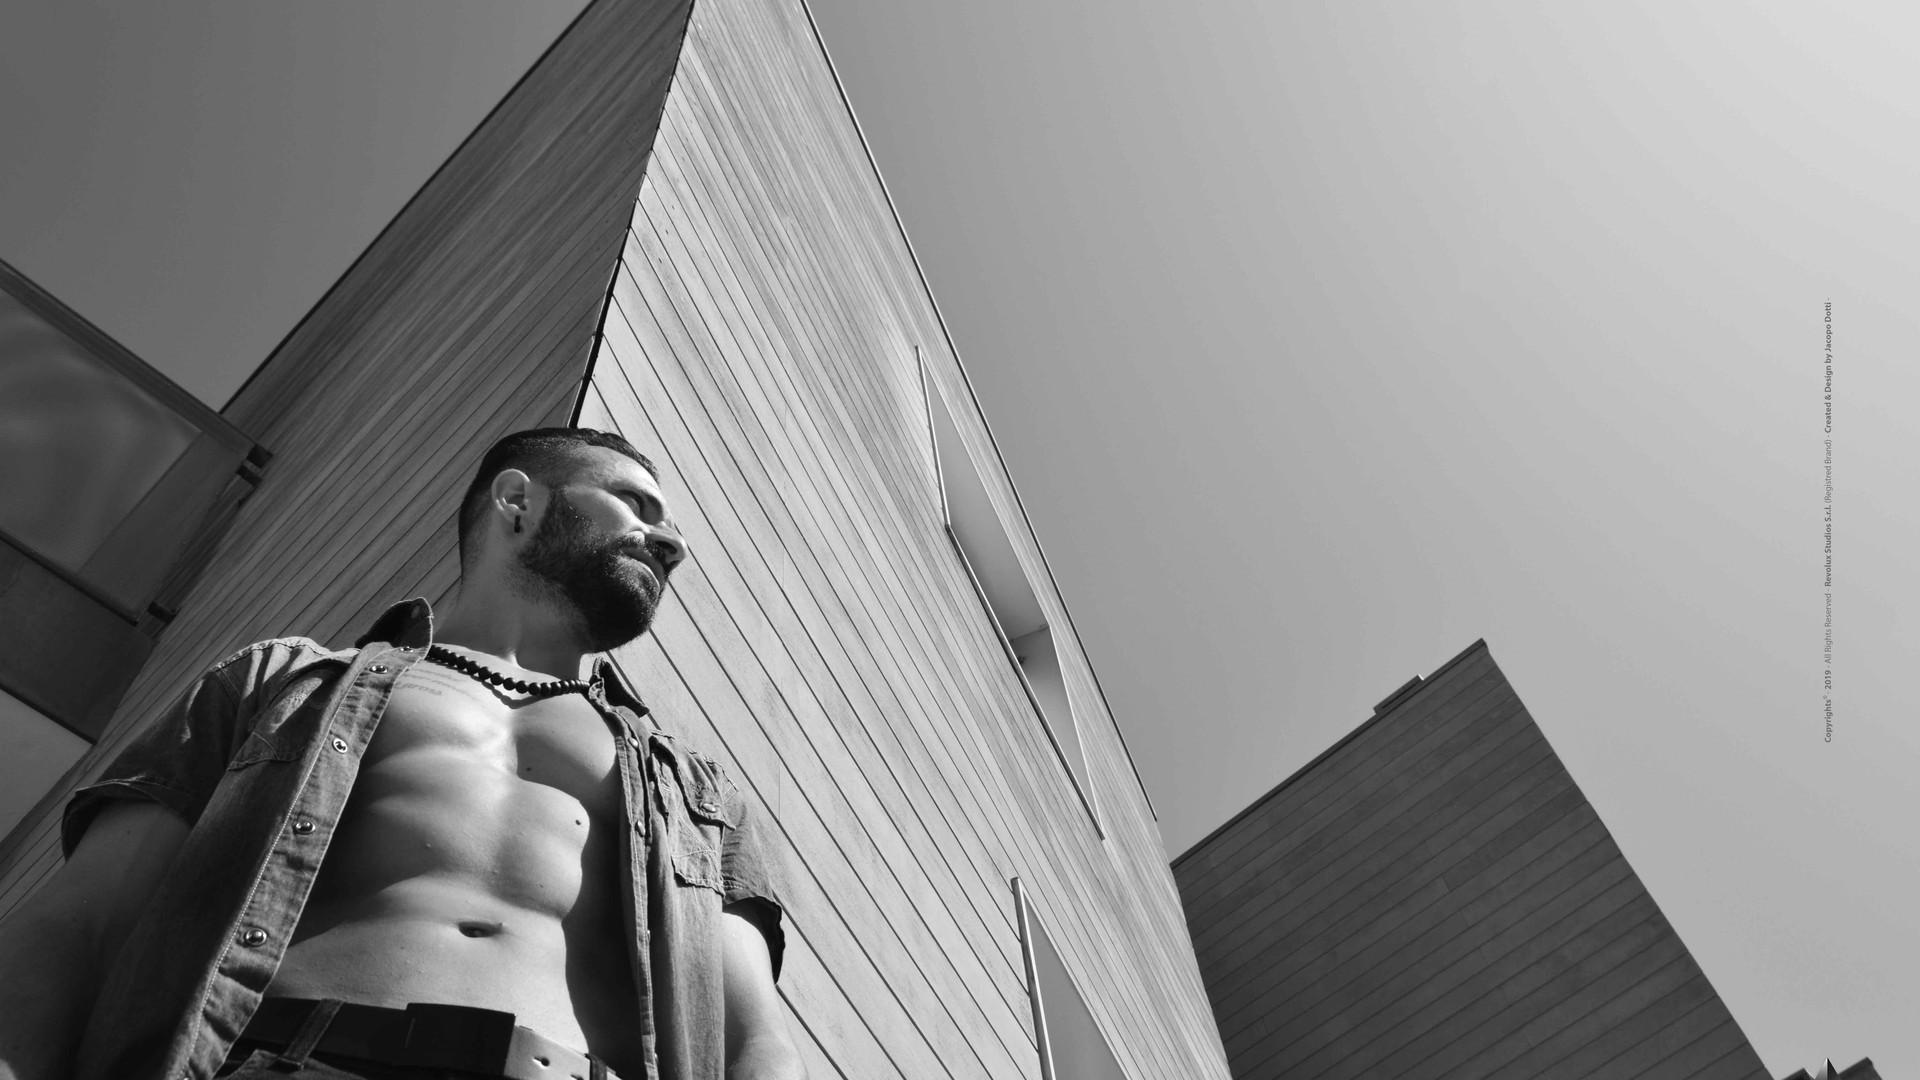 Revolux Studios - Jacopo Dotti - Photosh